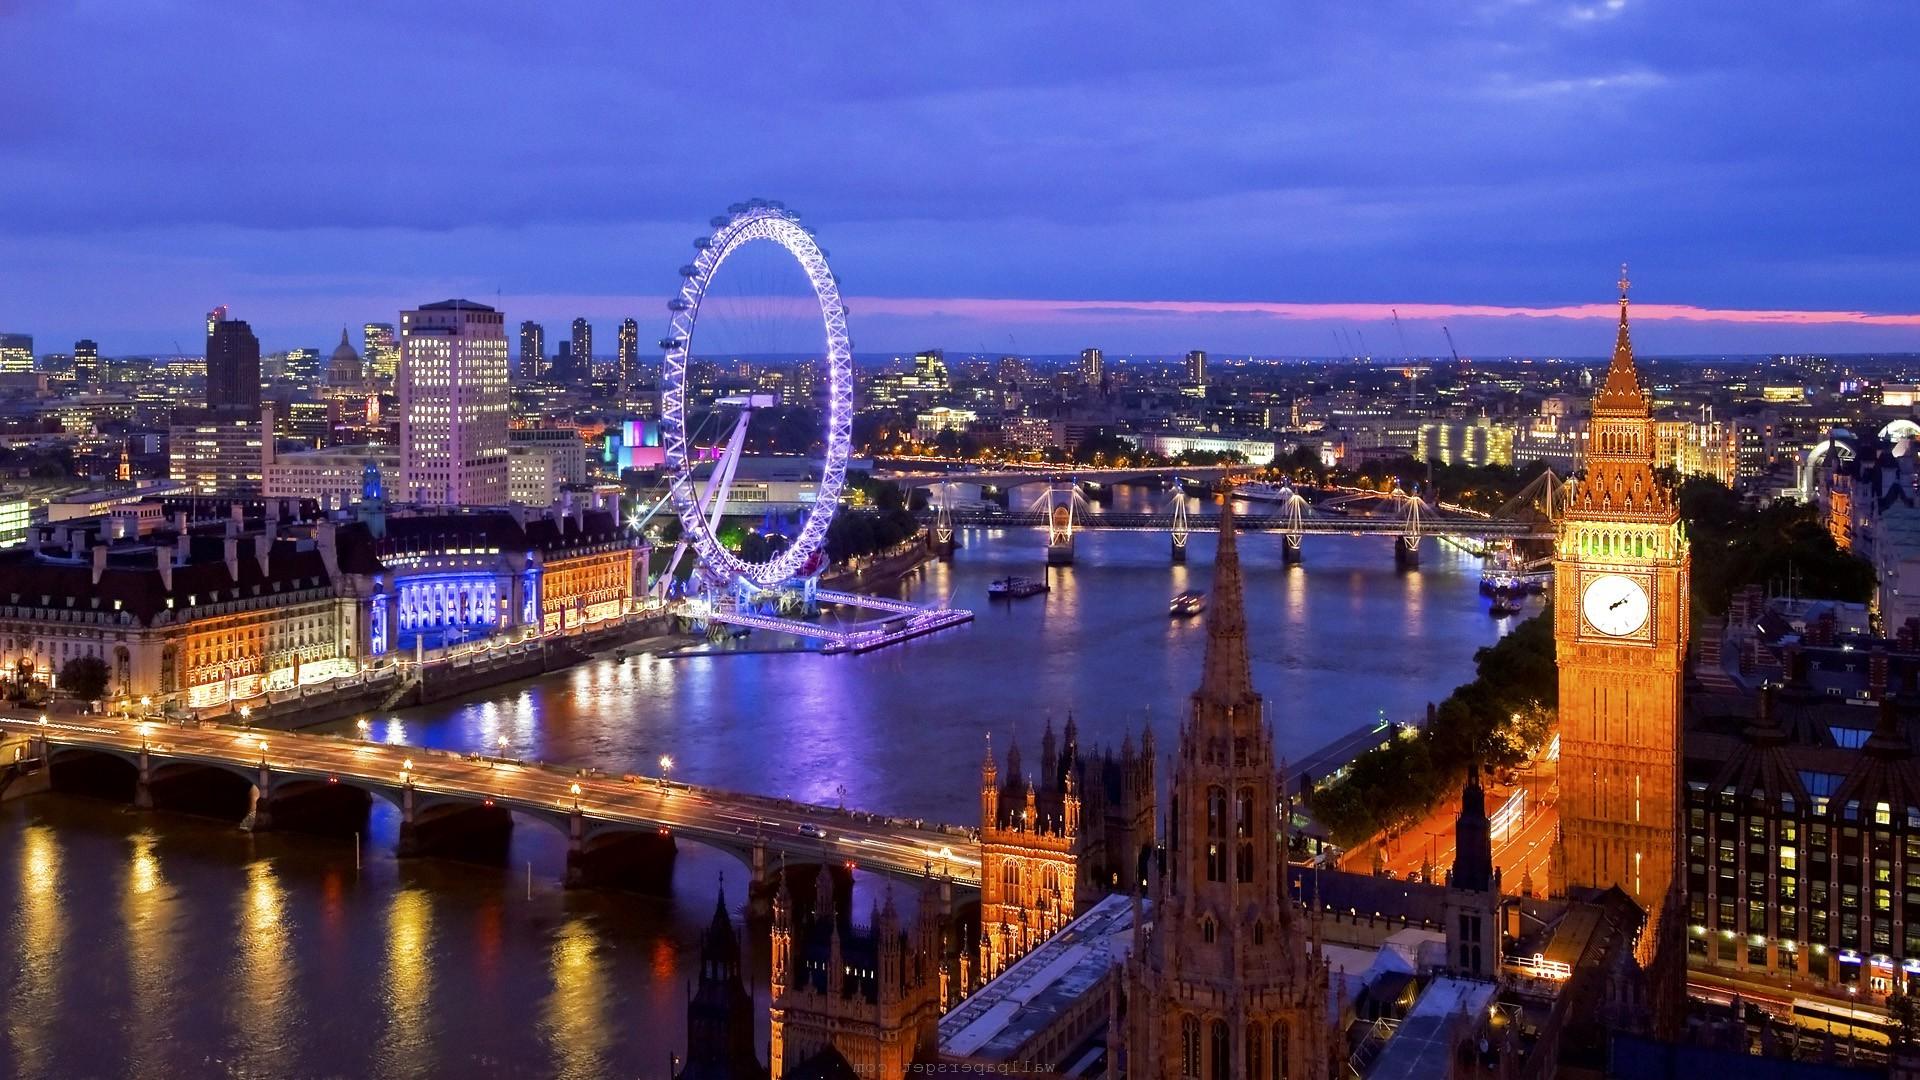 london-at-night-hd-zzx27hei-e1395682633110